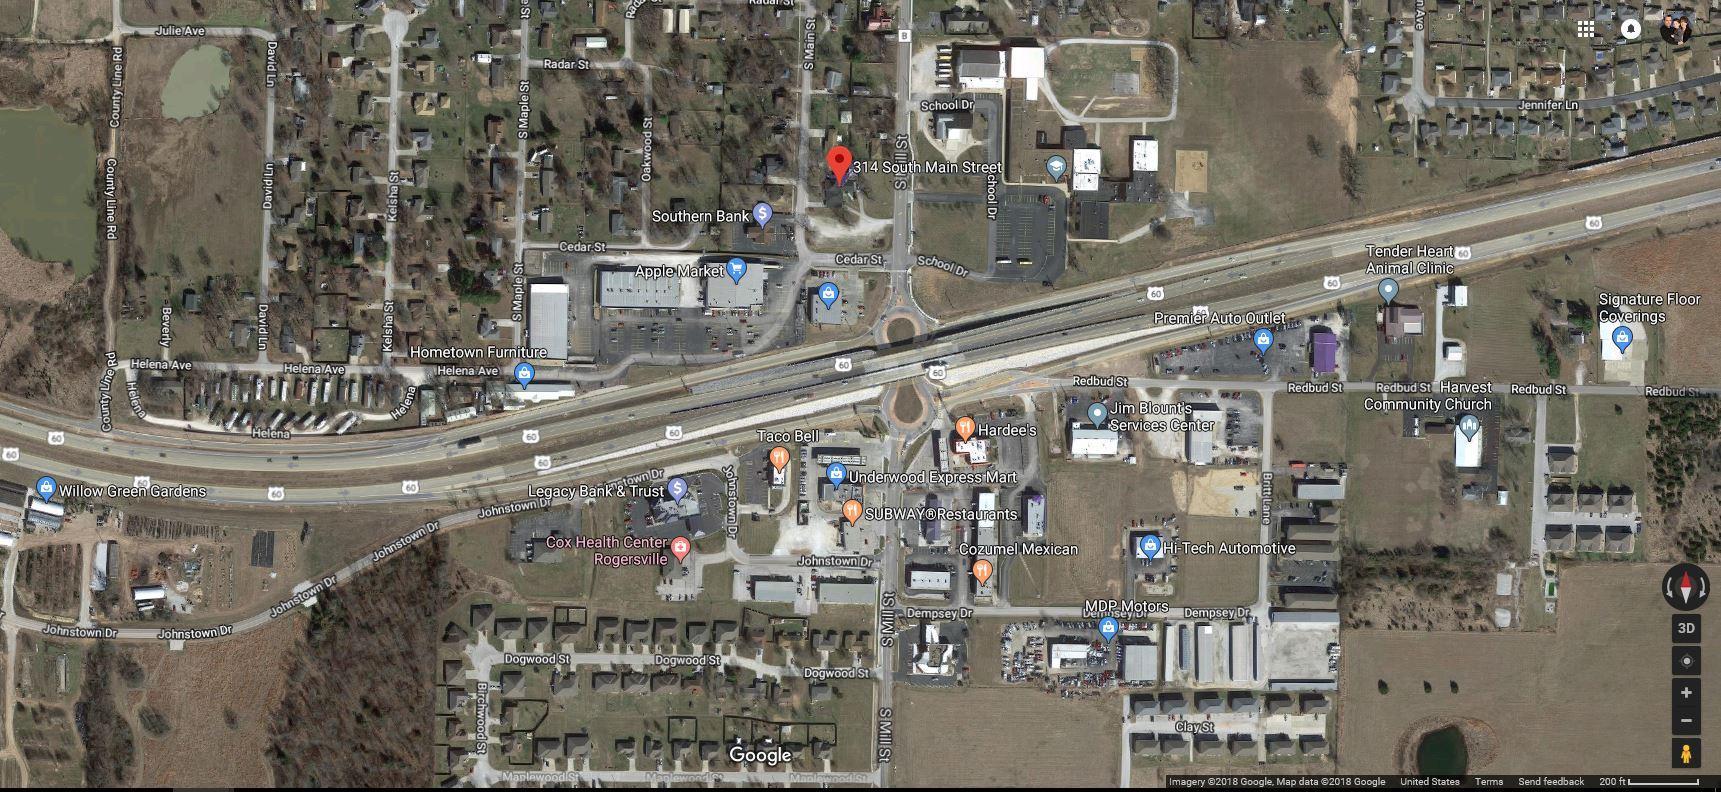 314 South Main Street Rogersville, MO 65742